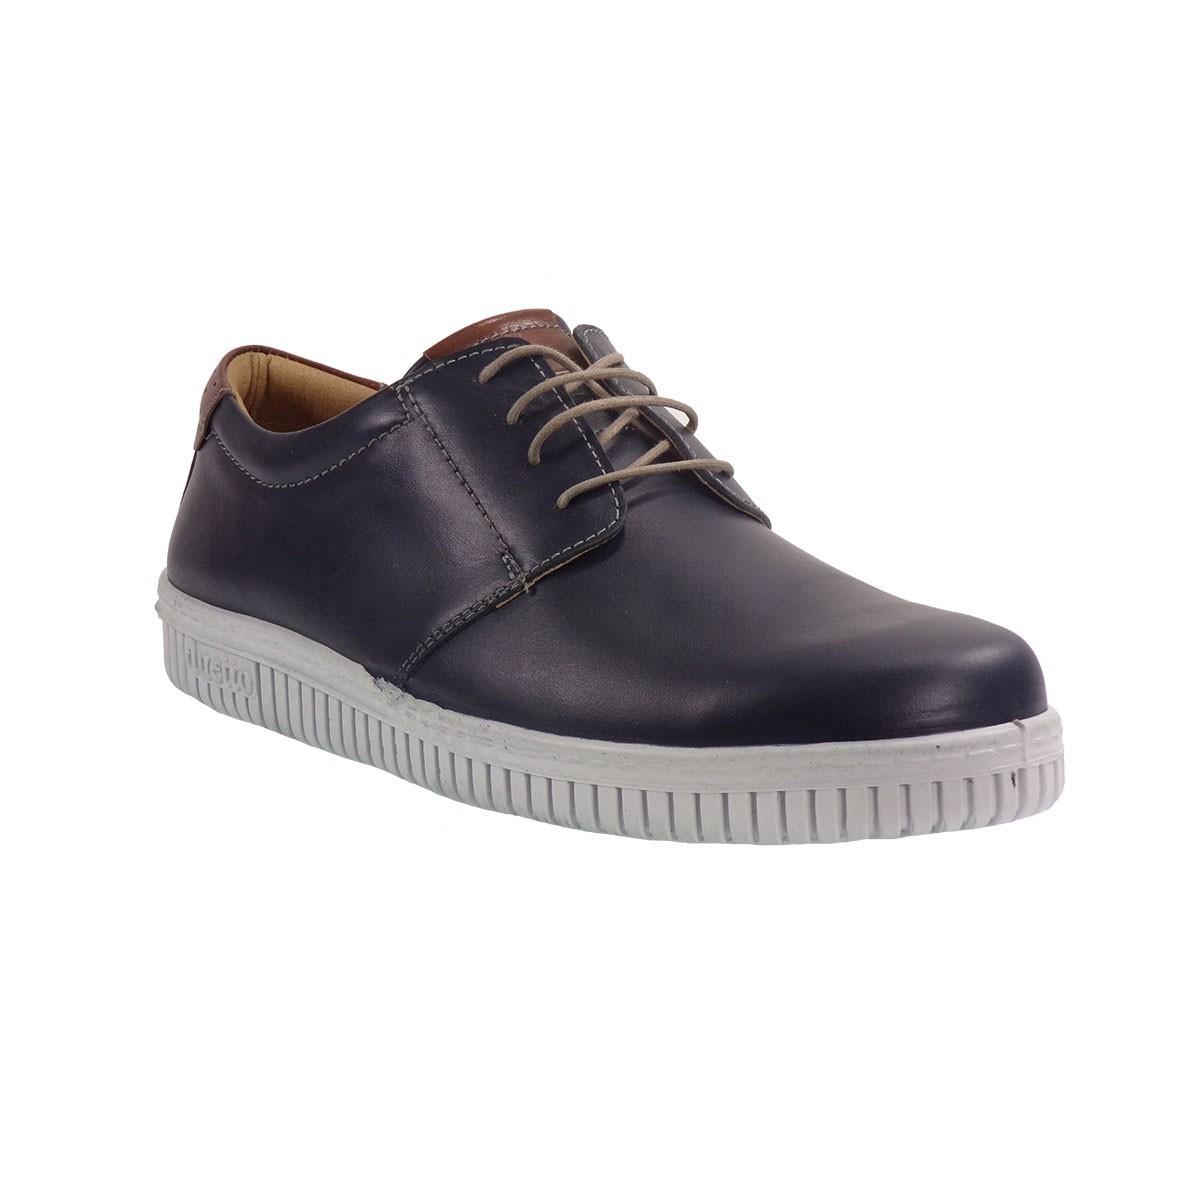 Aeropelma Duetto Ανδρικά Παπούτσια 209 Μπλέ Δέρμα